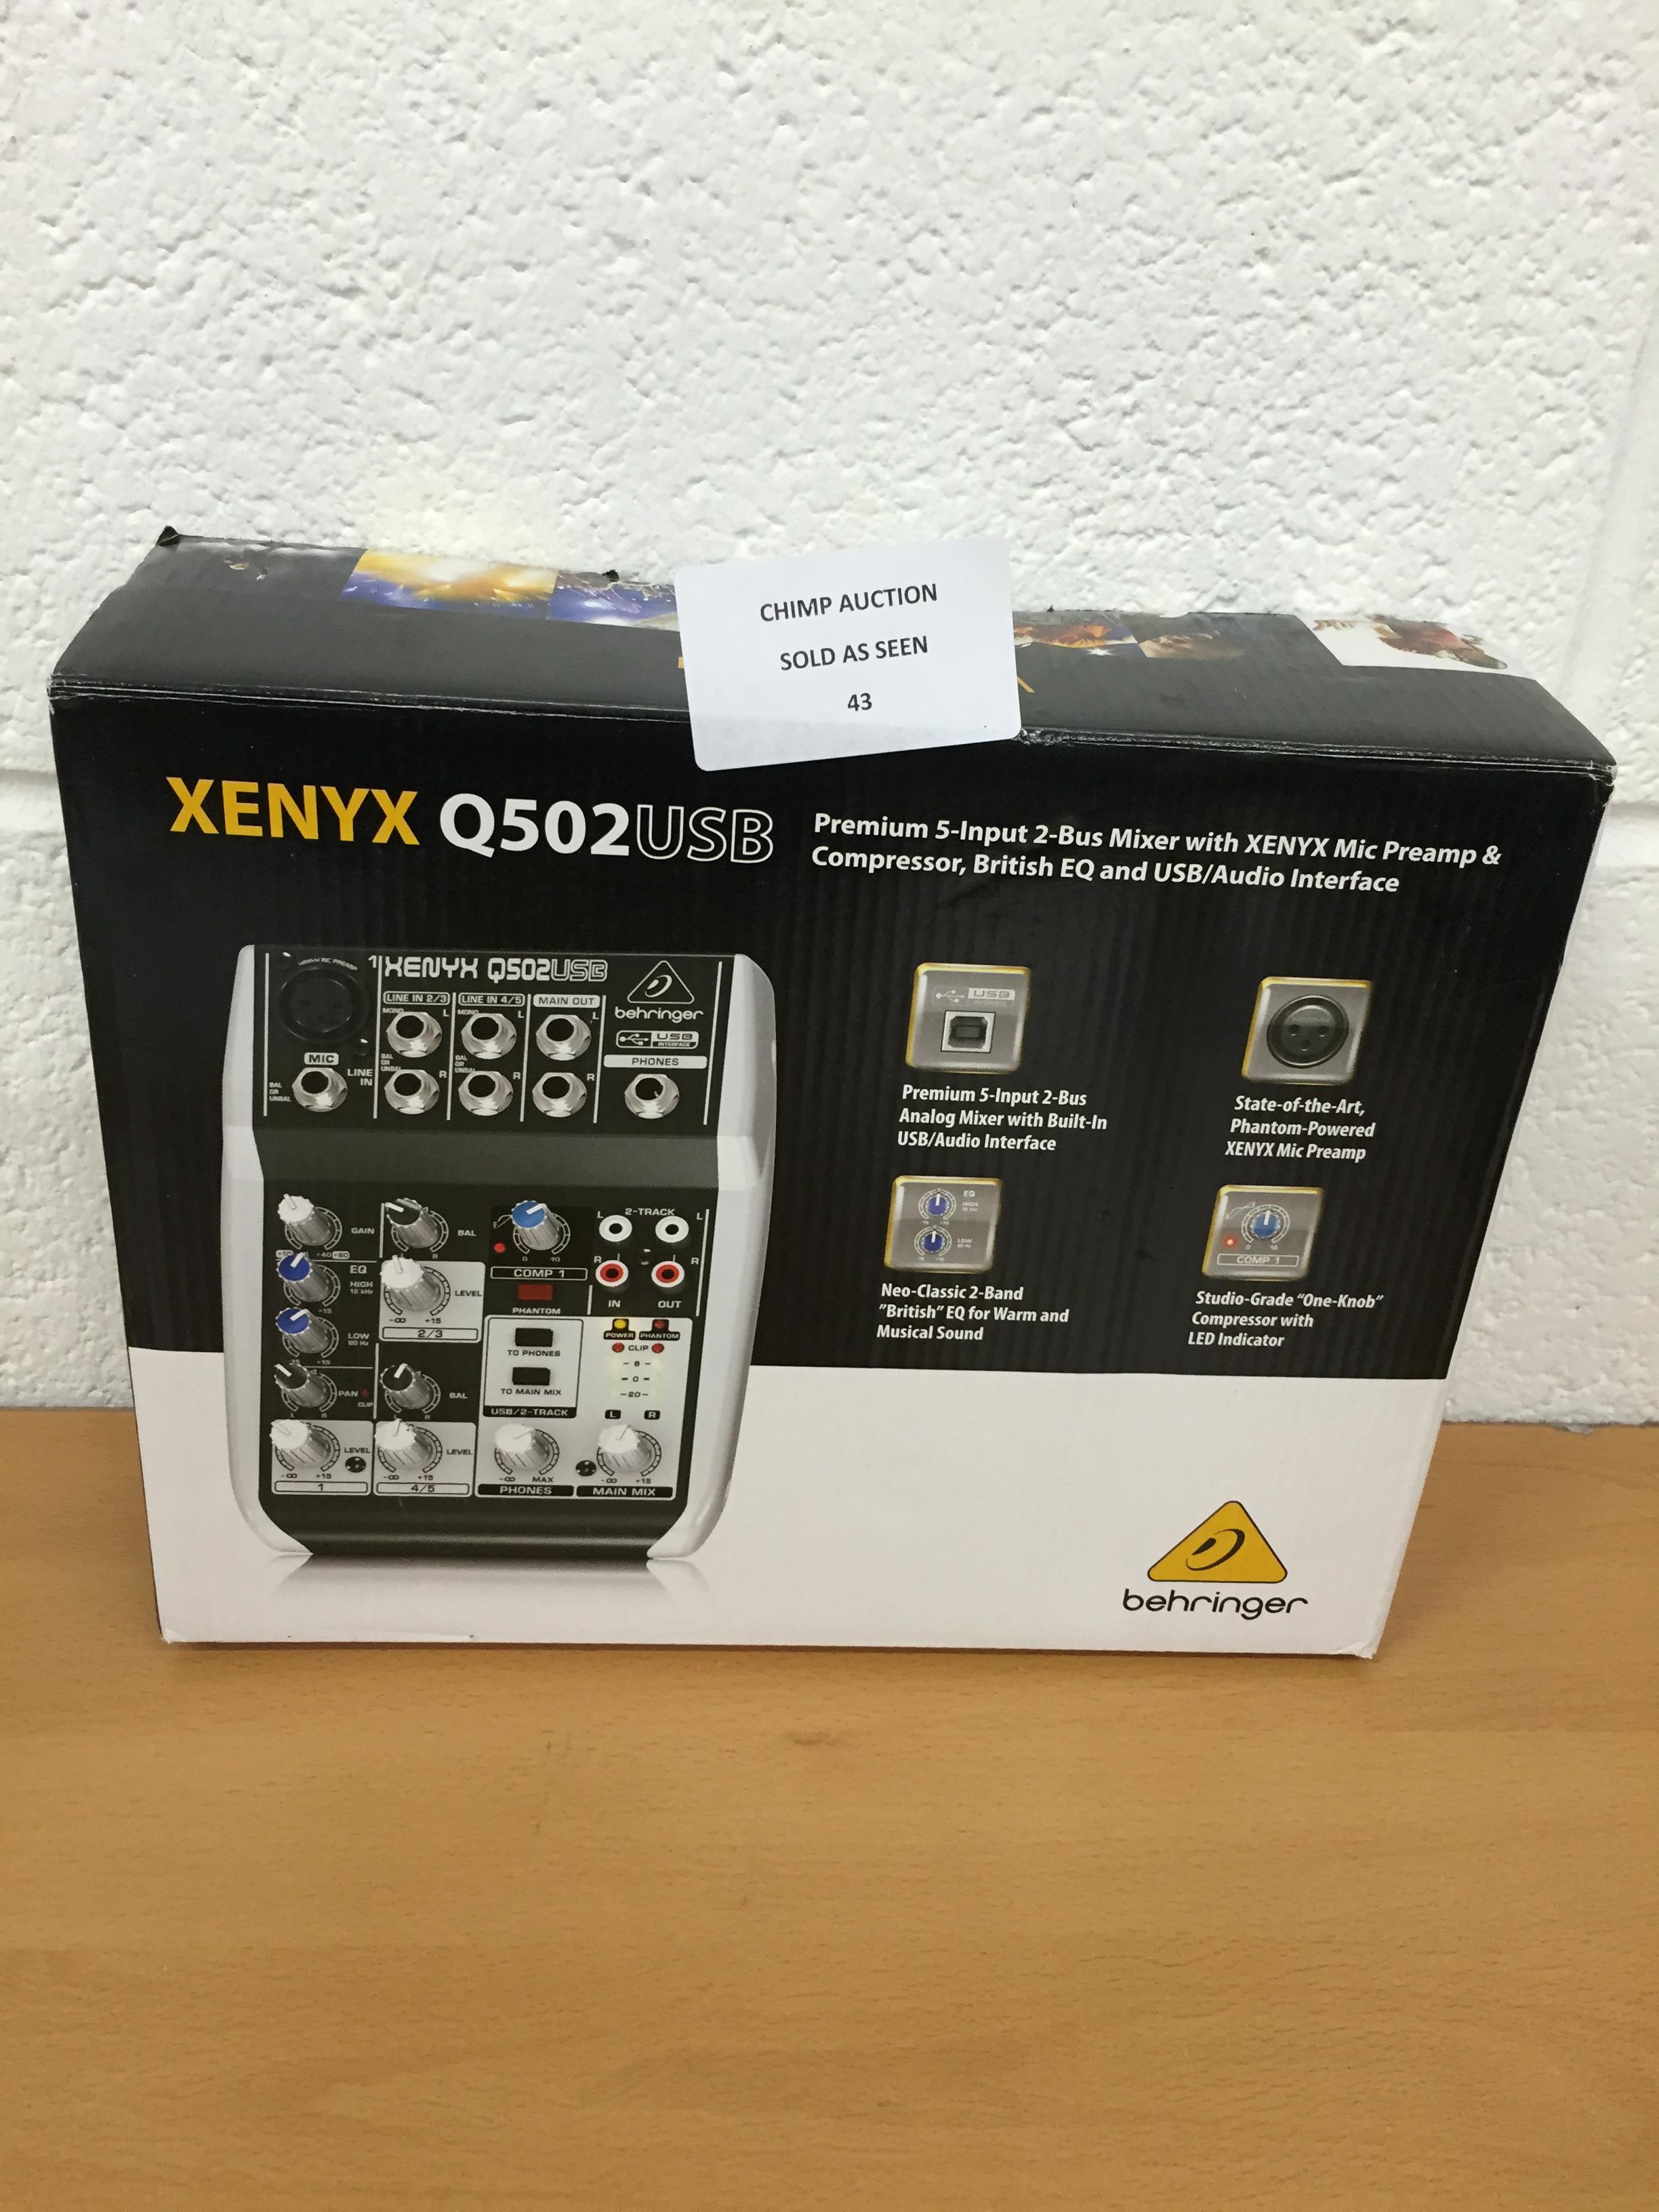 Lot 43 - Behringer Xenyx Q502USB Premium 5- input EQ USB Audio Interface RRP £79.99